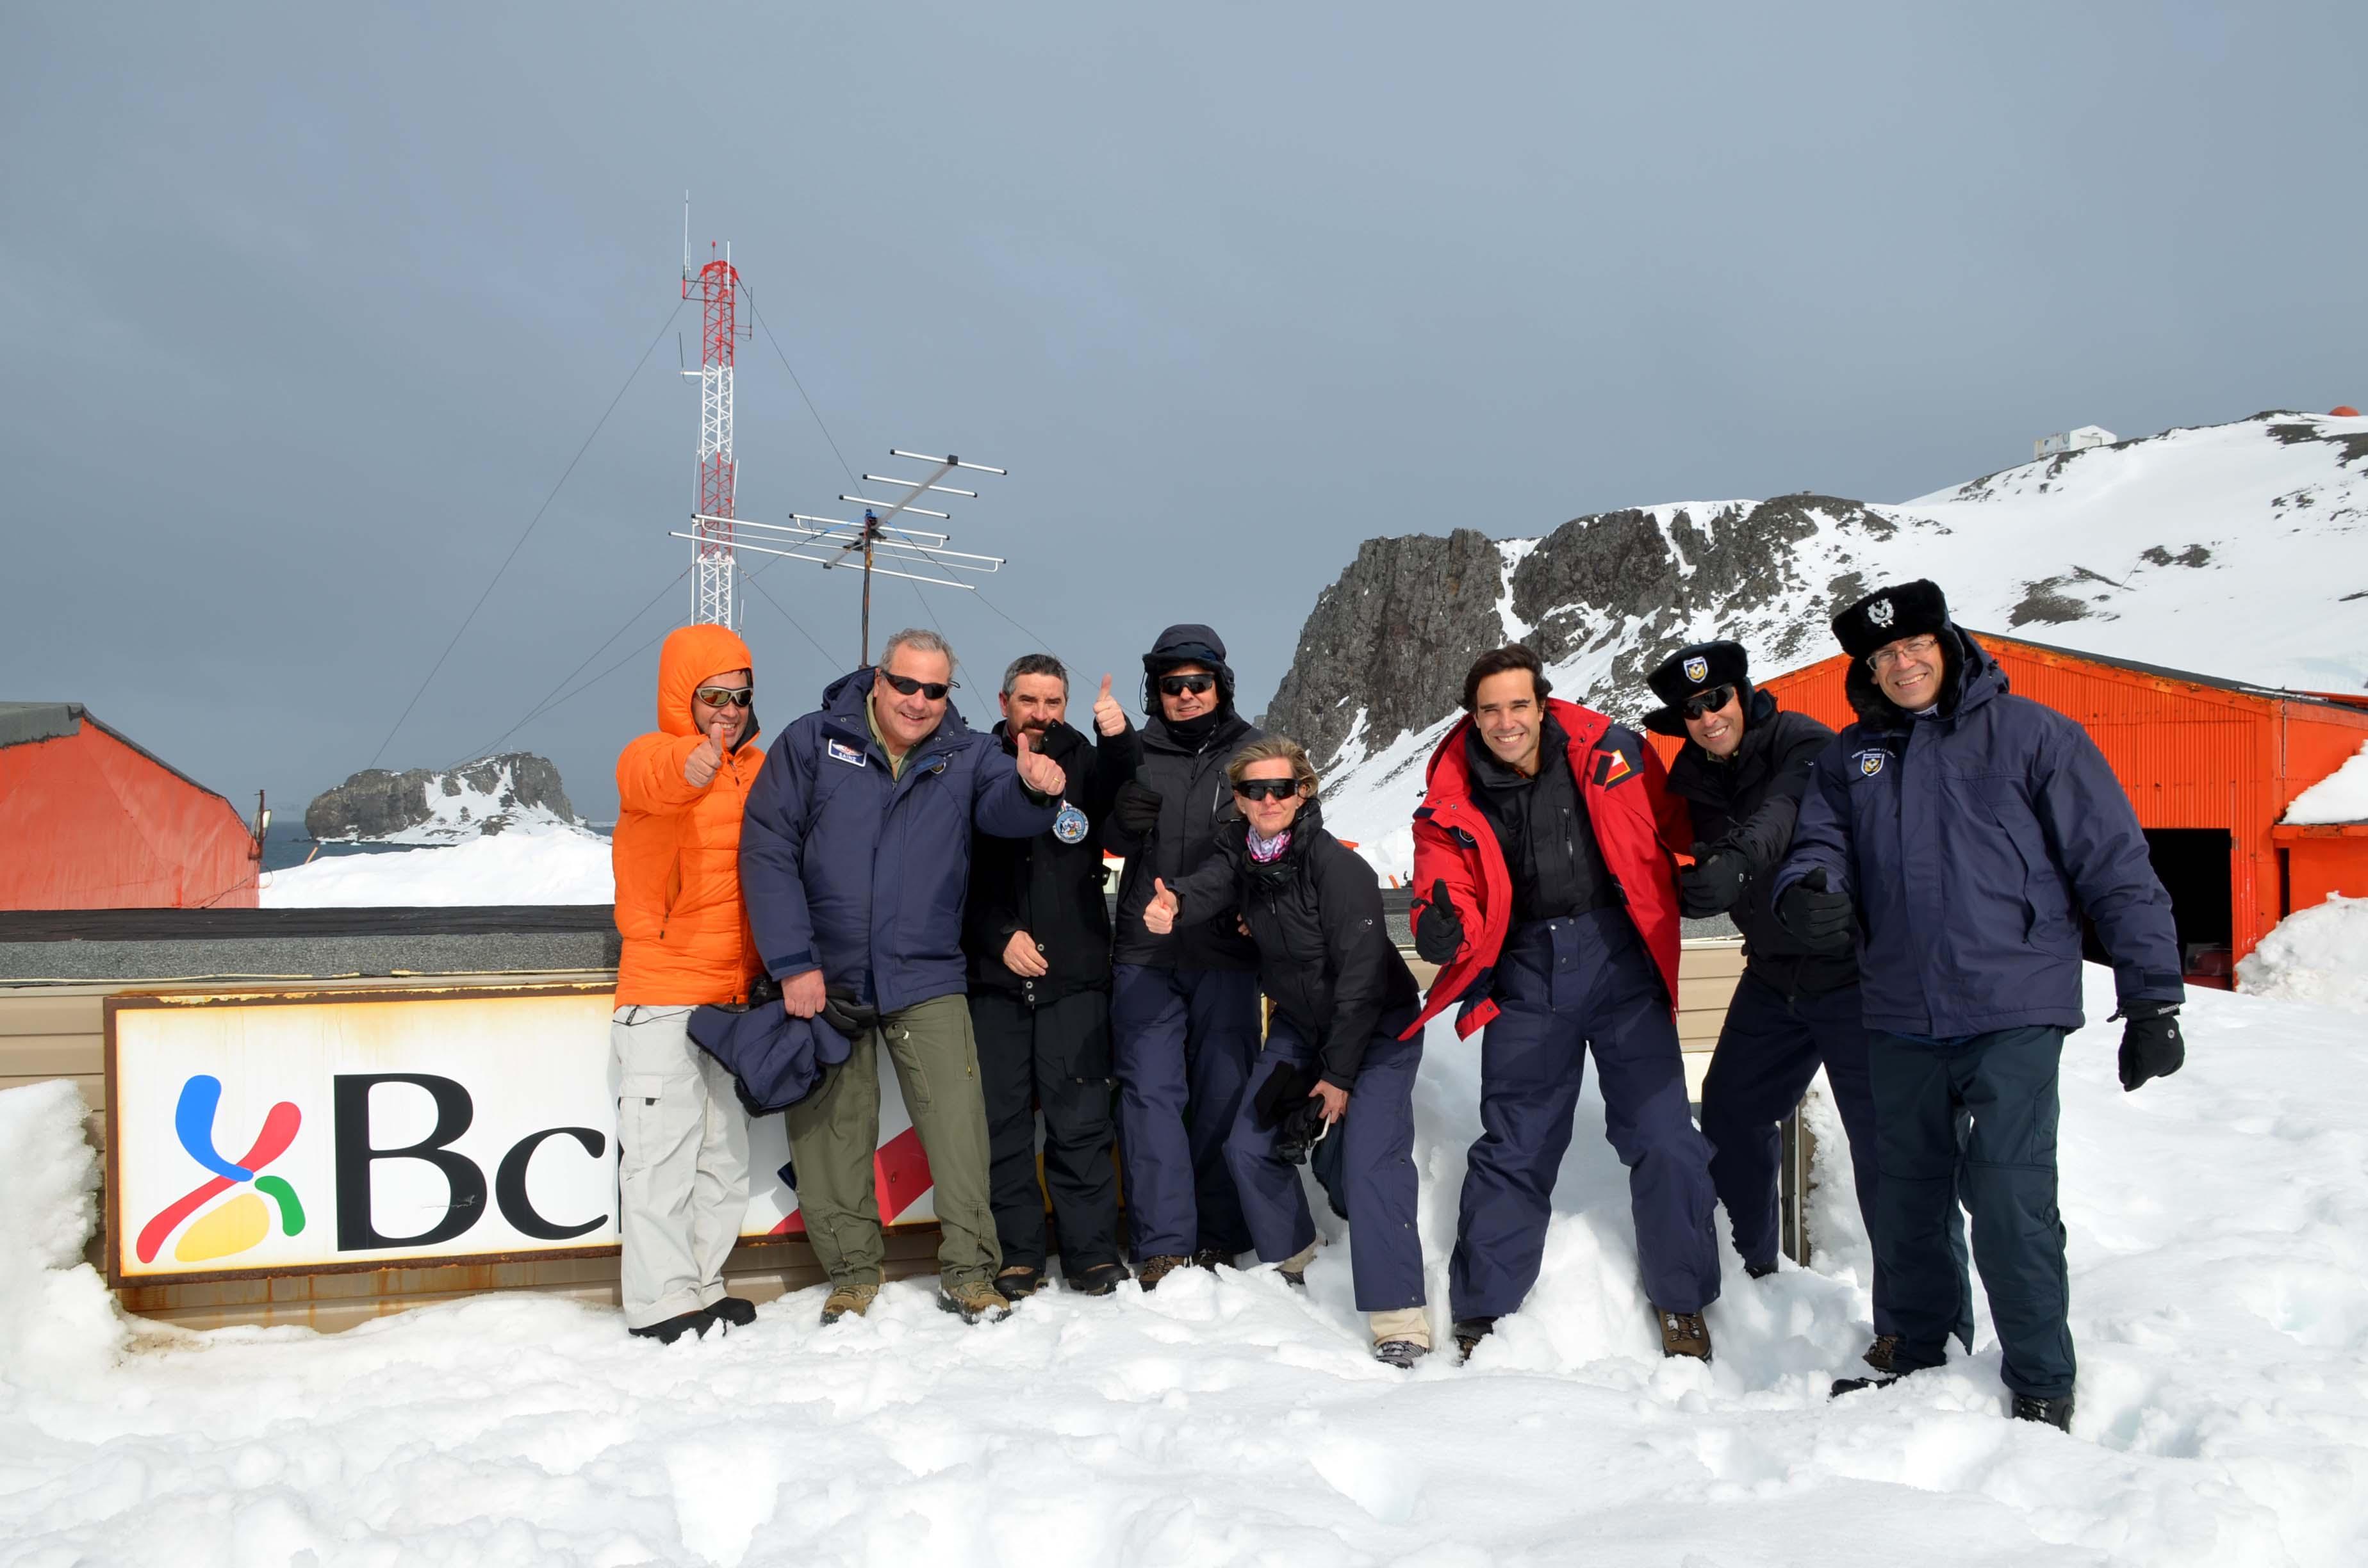 BCI Antártica.